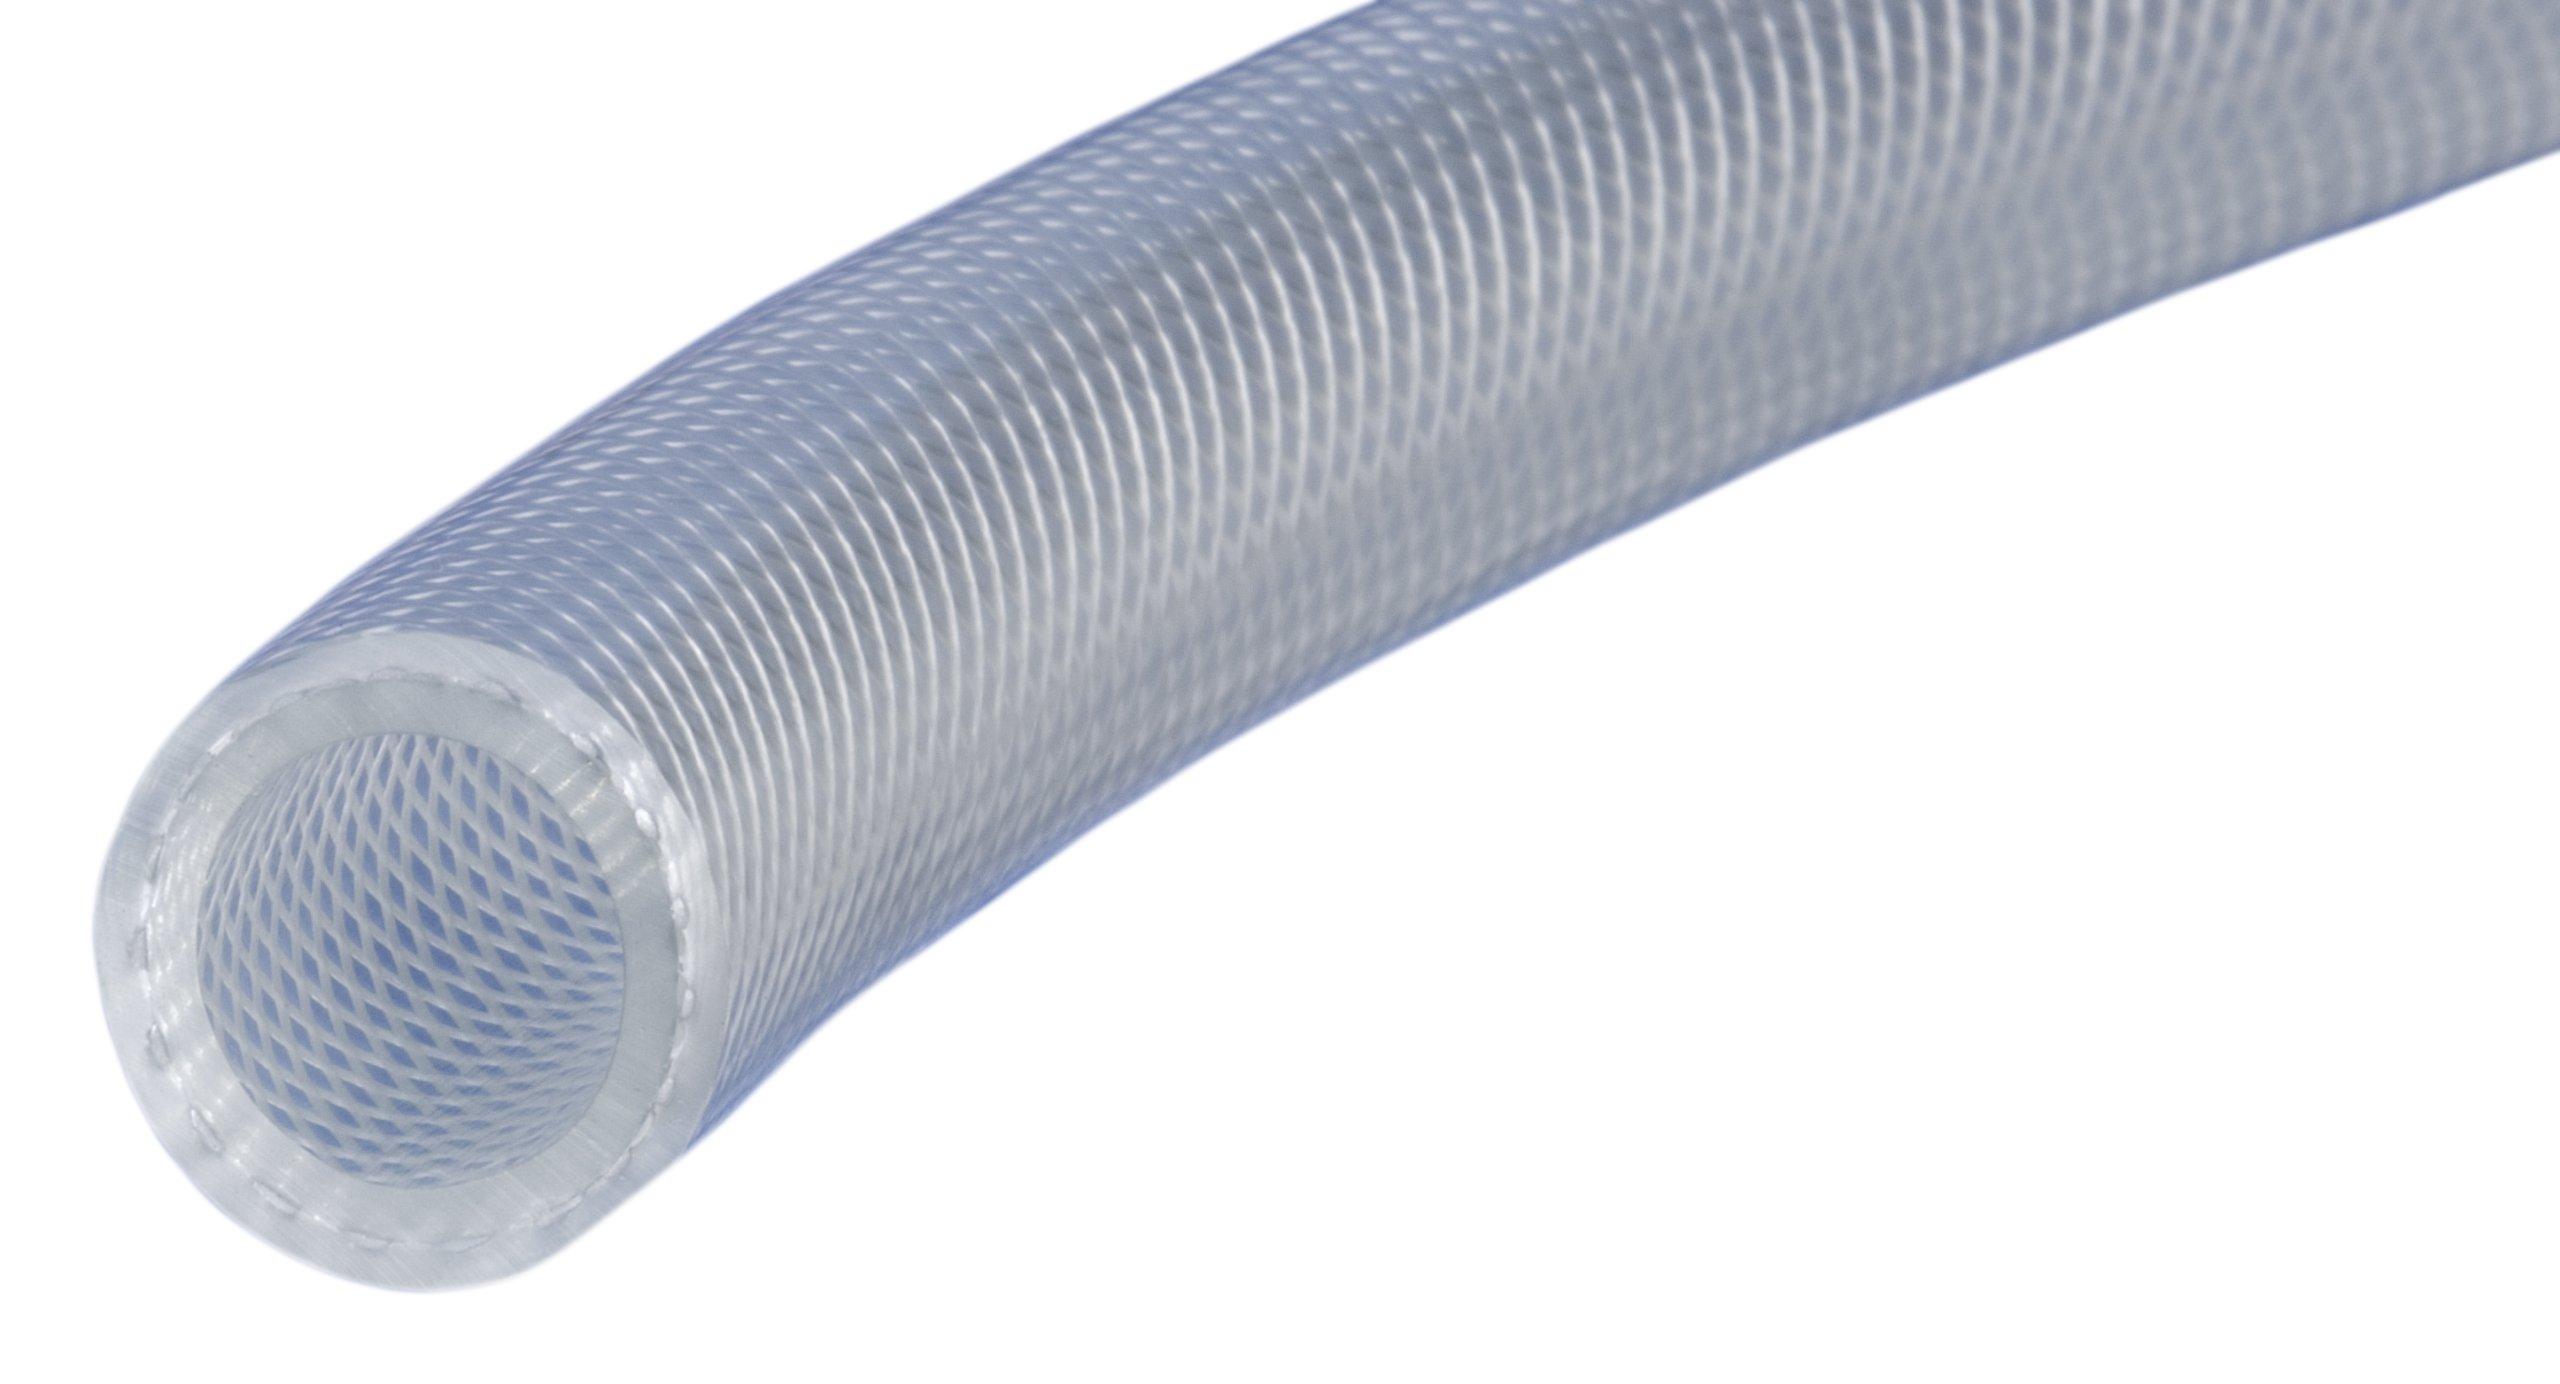 Kuriyama Kuri Tec K3280 Series PVC Flexible Connection Hose, 180 psi, 500' Length x 0.260'' ID, Clear